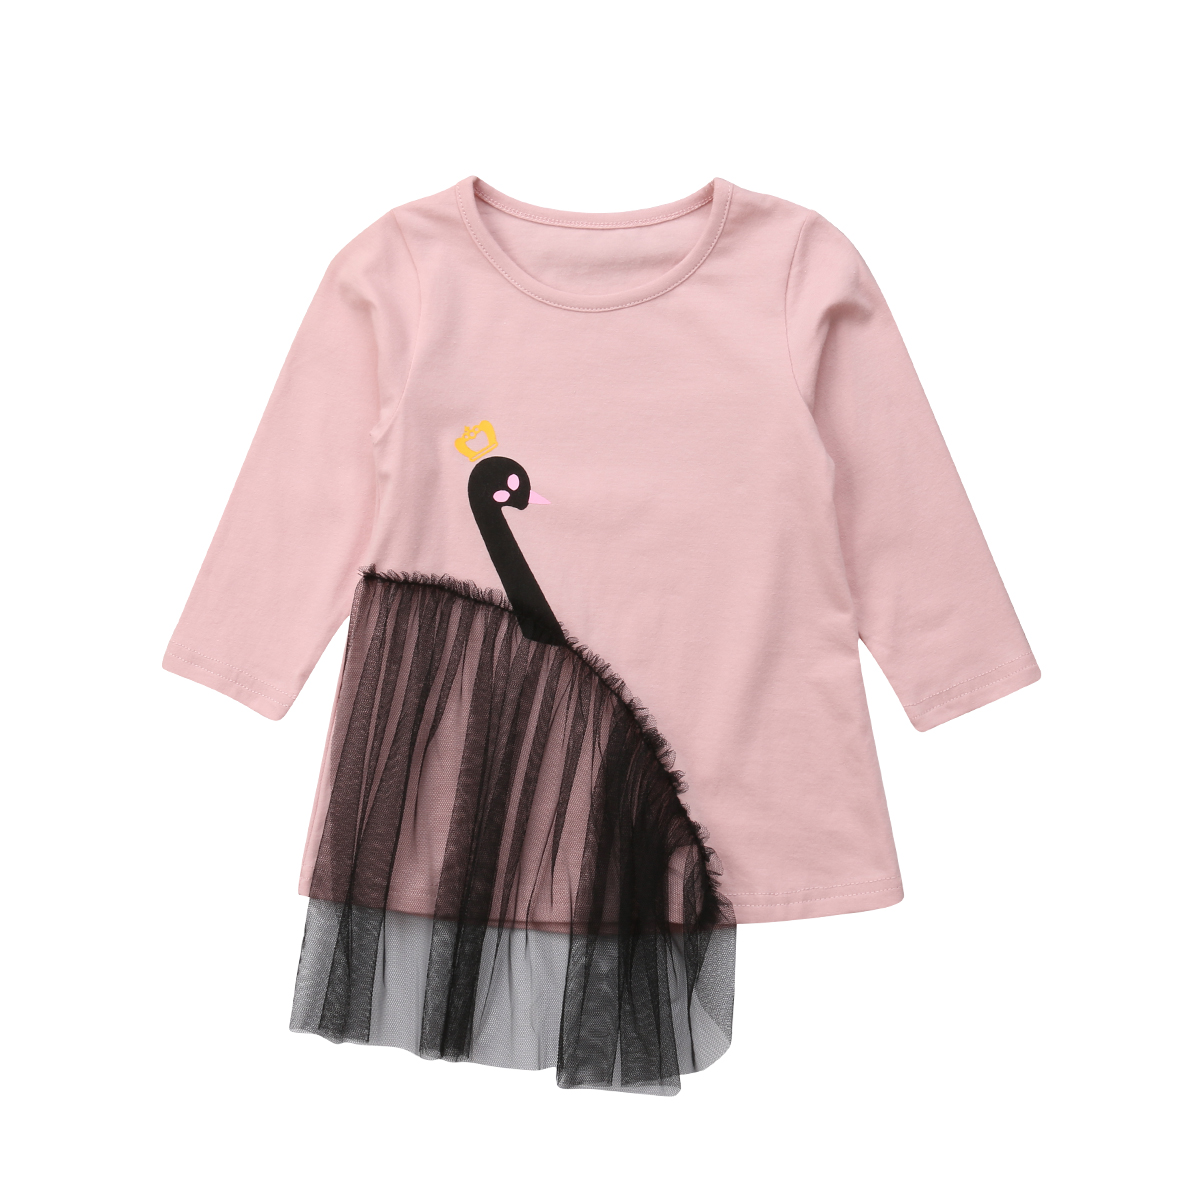 Pullover Sweatshirts Ehrlich Herbst Winter Nette Reizende Flamingo Print Sweatshirt Tops Langarm Pullover Rosa Spitze Baumwolle Kleid Tops 6m-5y Mutter & Kinder